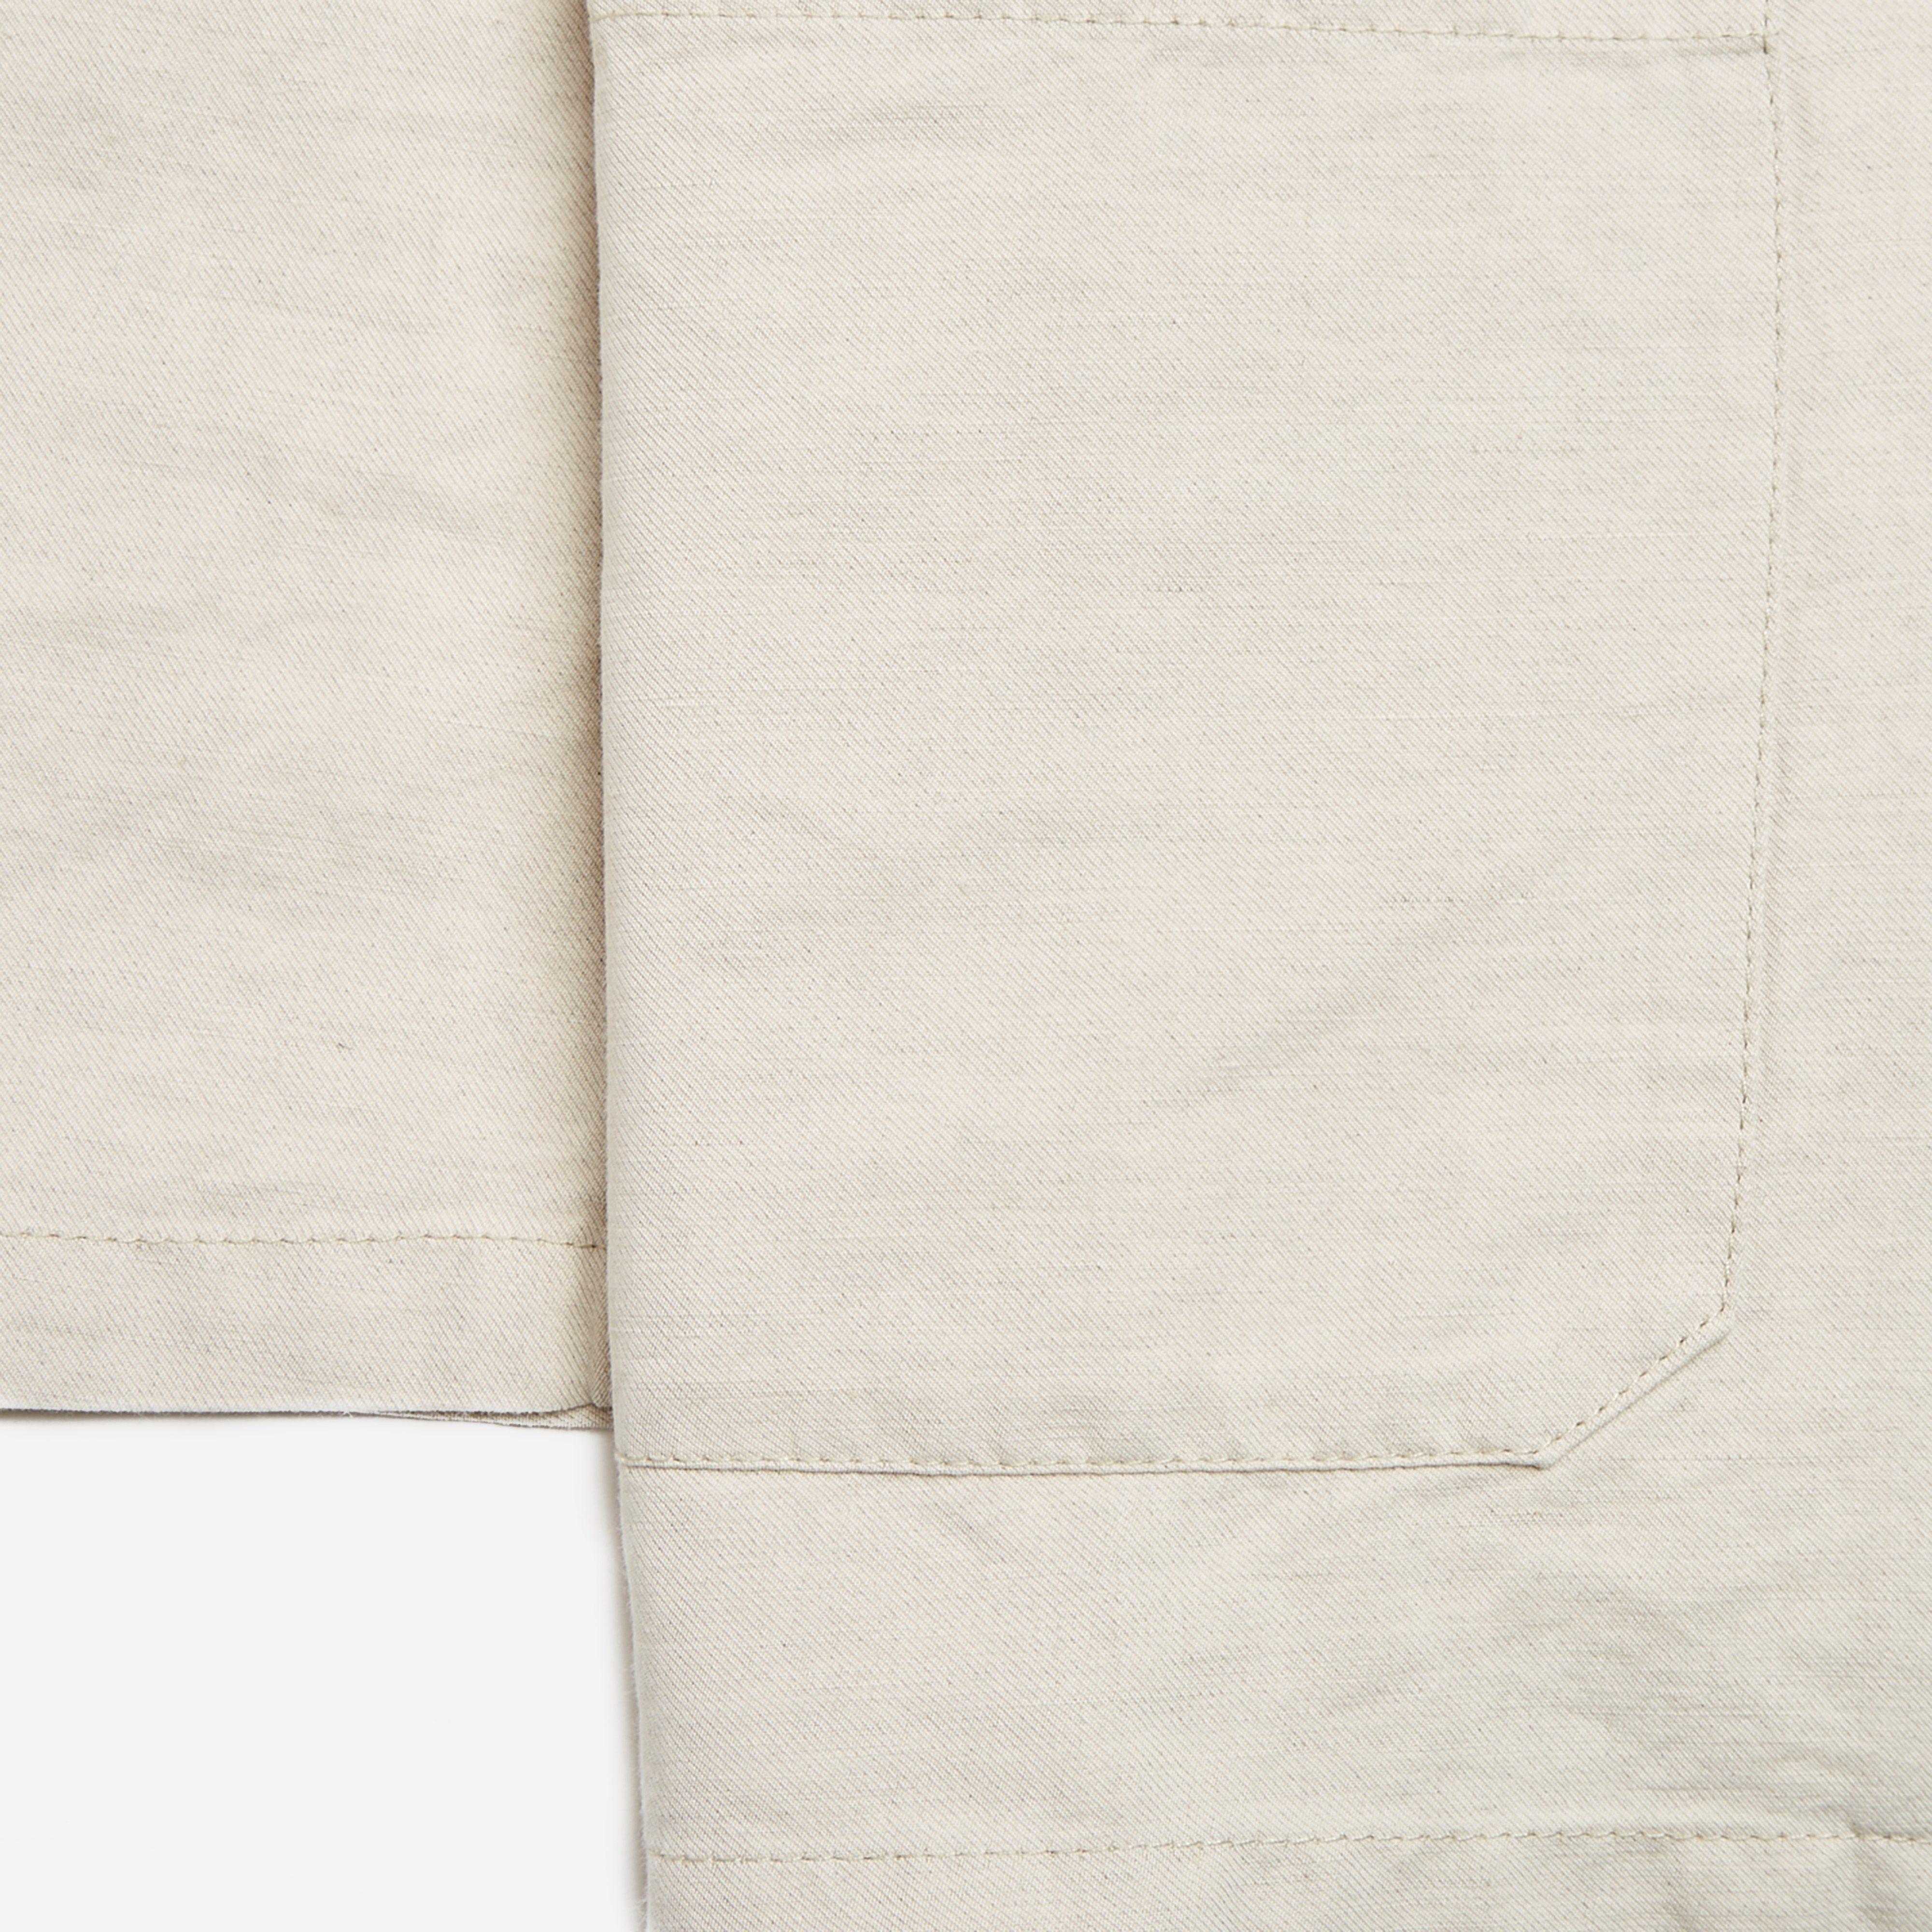 Vetra 35 Cotton Linen Jacket